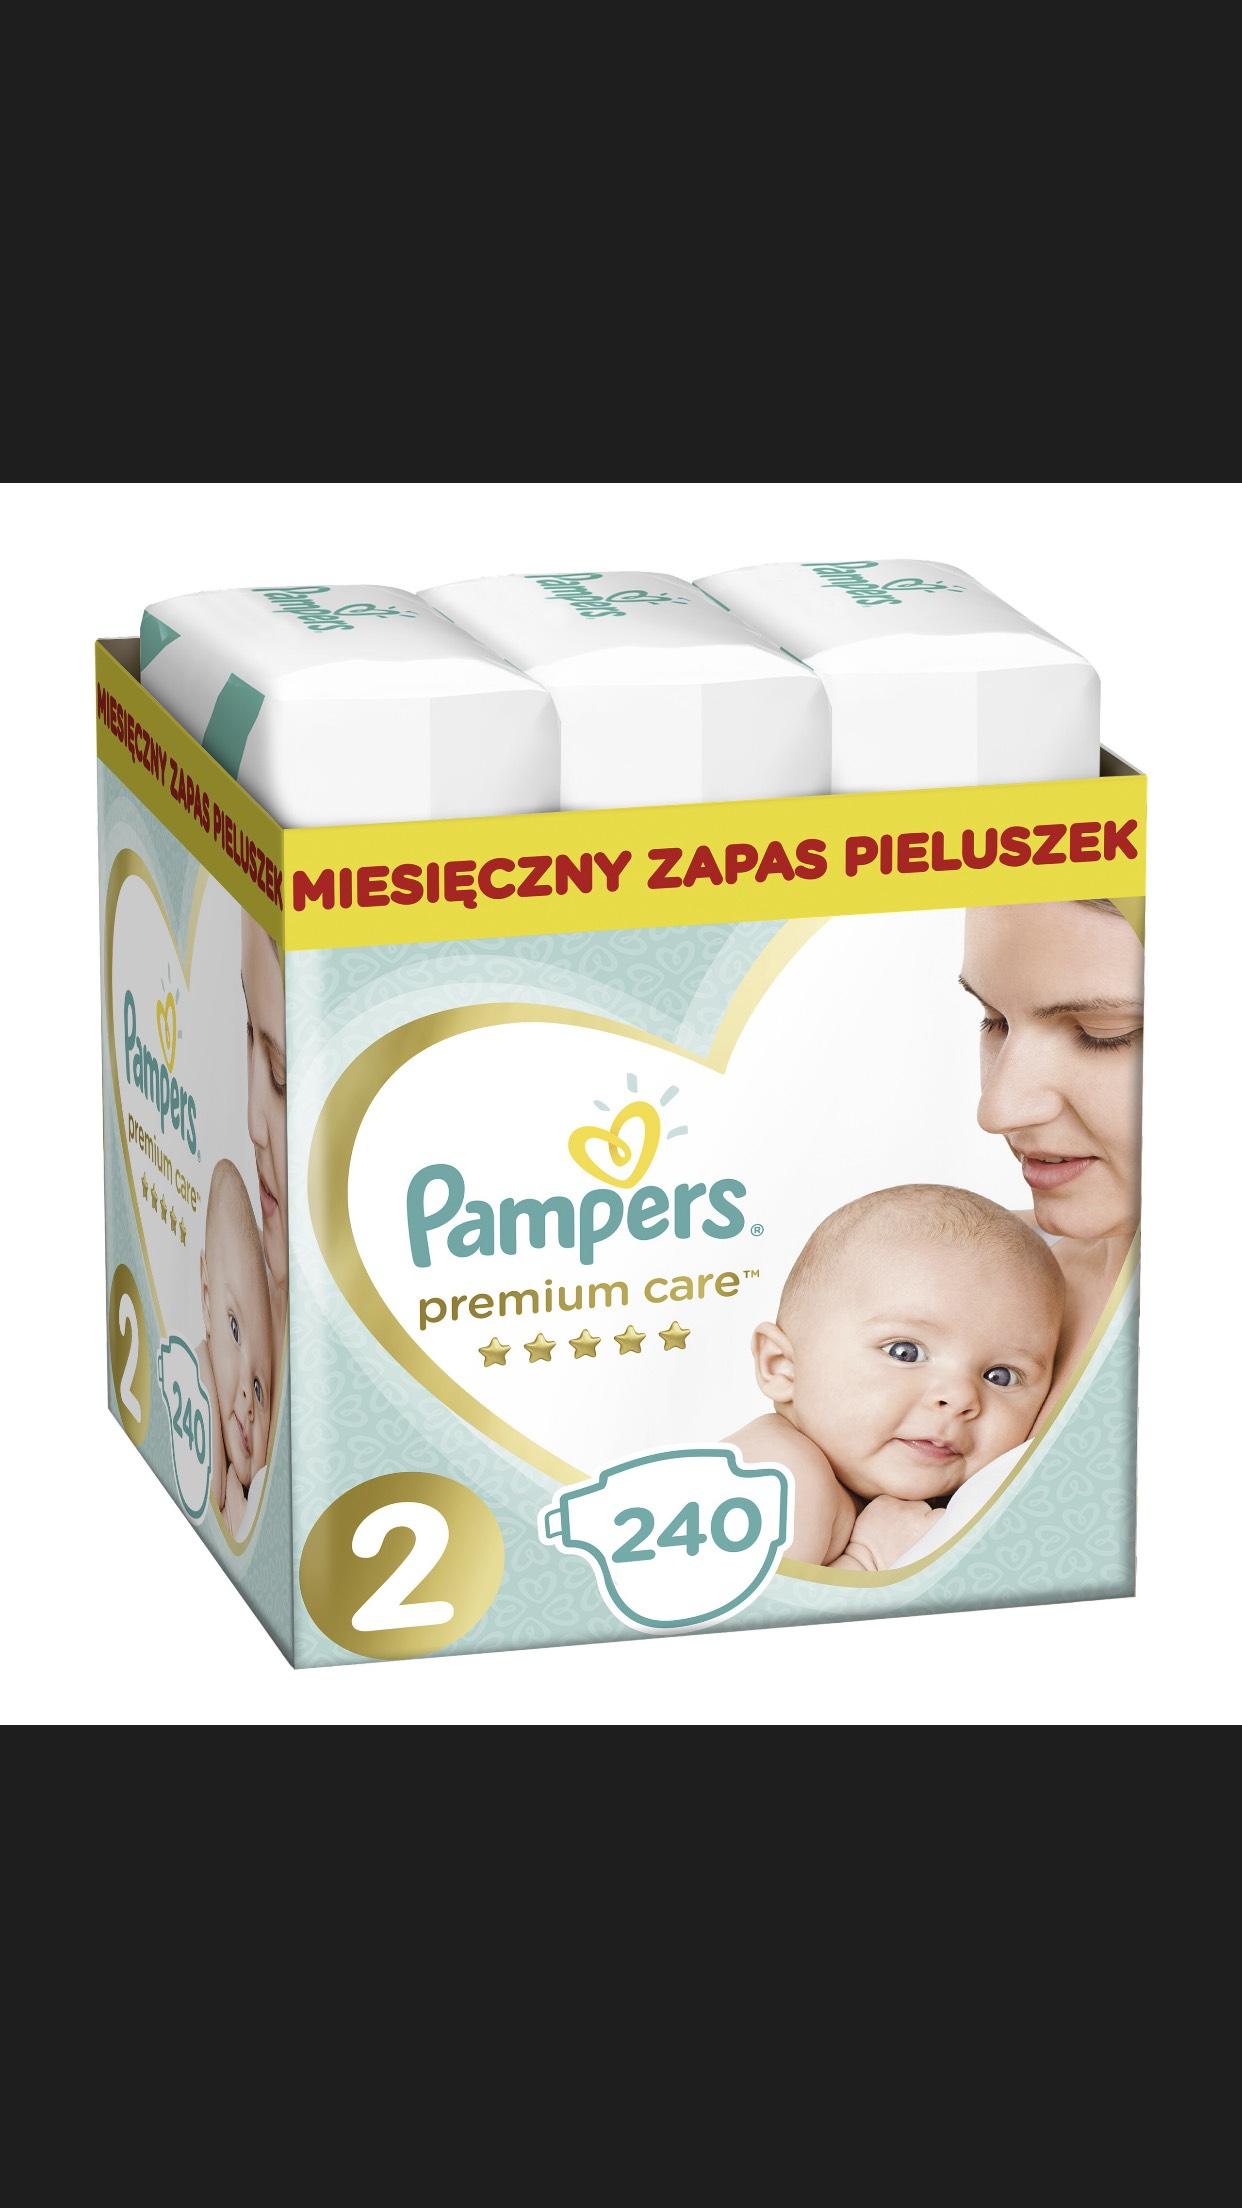 Pampers Premium Care 2 240szt.